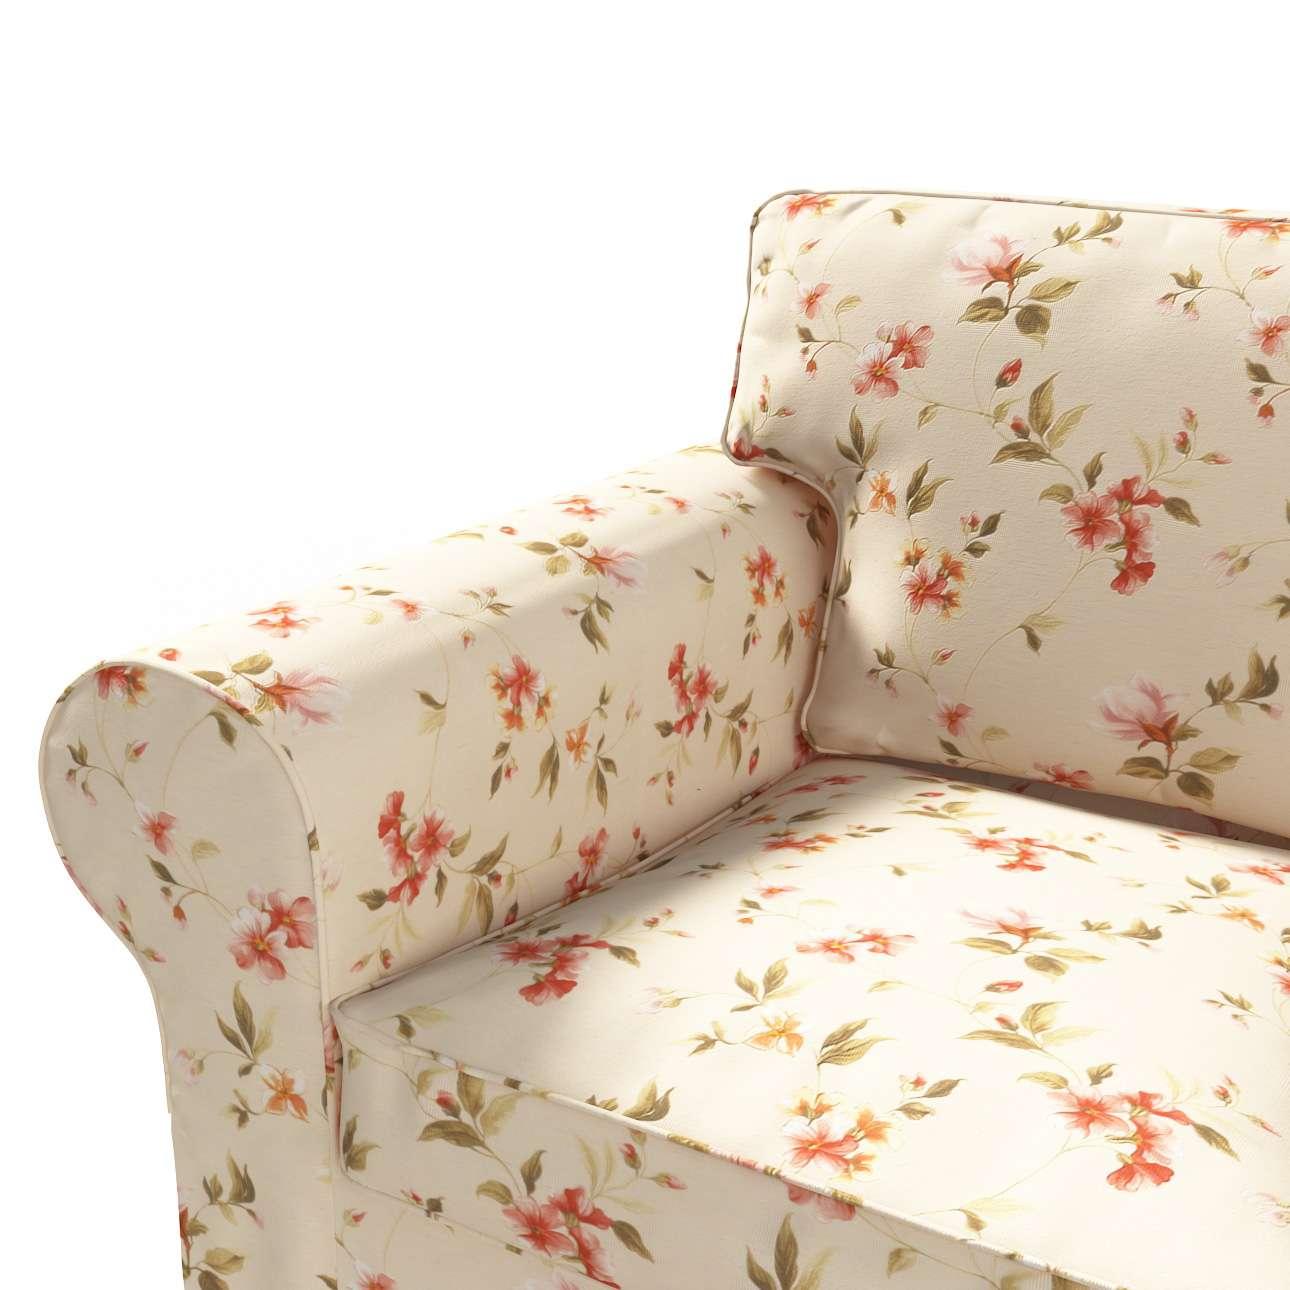 Ektorp 2-Sitzer Schlafsofabezug  ALTES Modell Sofabezug Ektorp 2-Sitzer Schlafsofa altes Modell von der Kollektion Londres, Stoff: 124-05